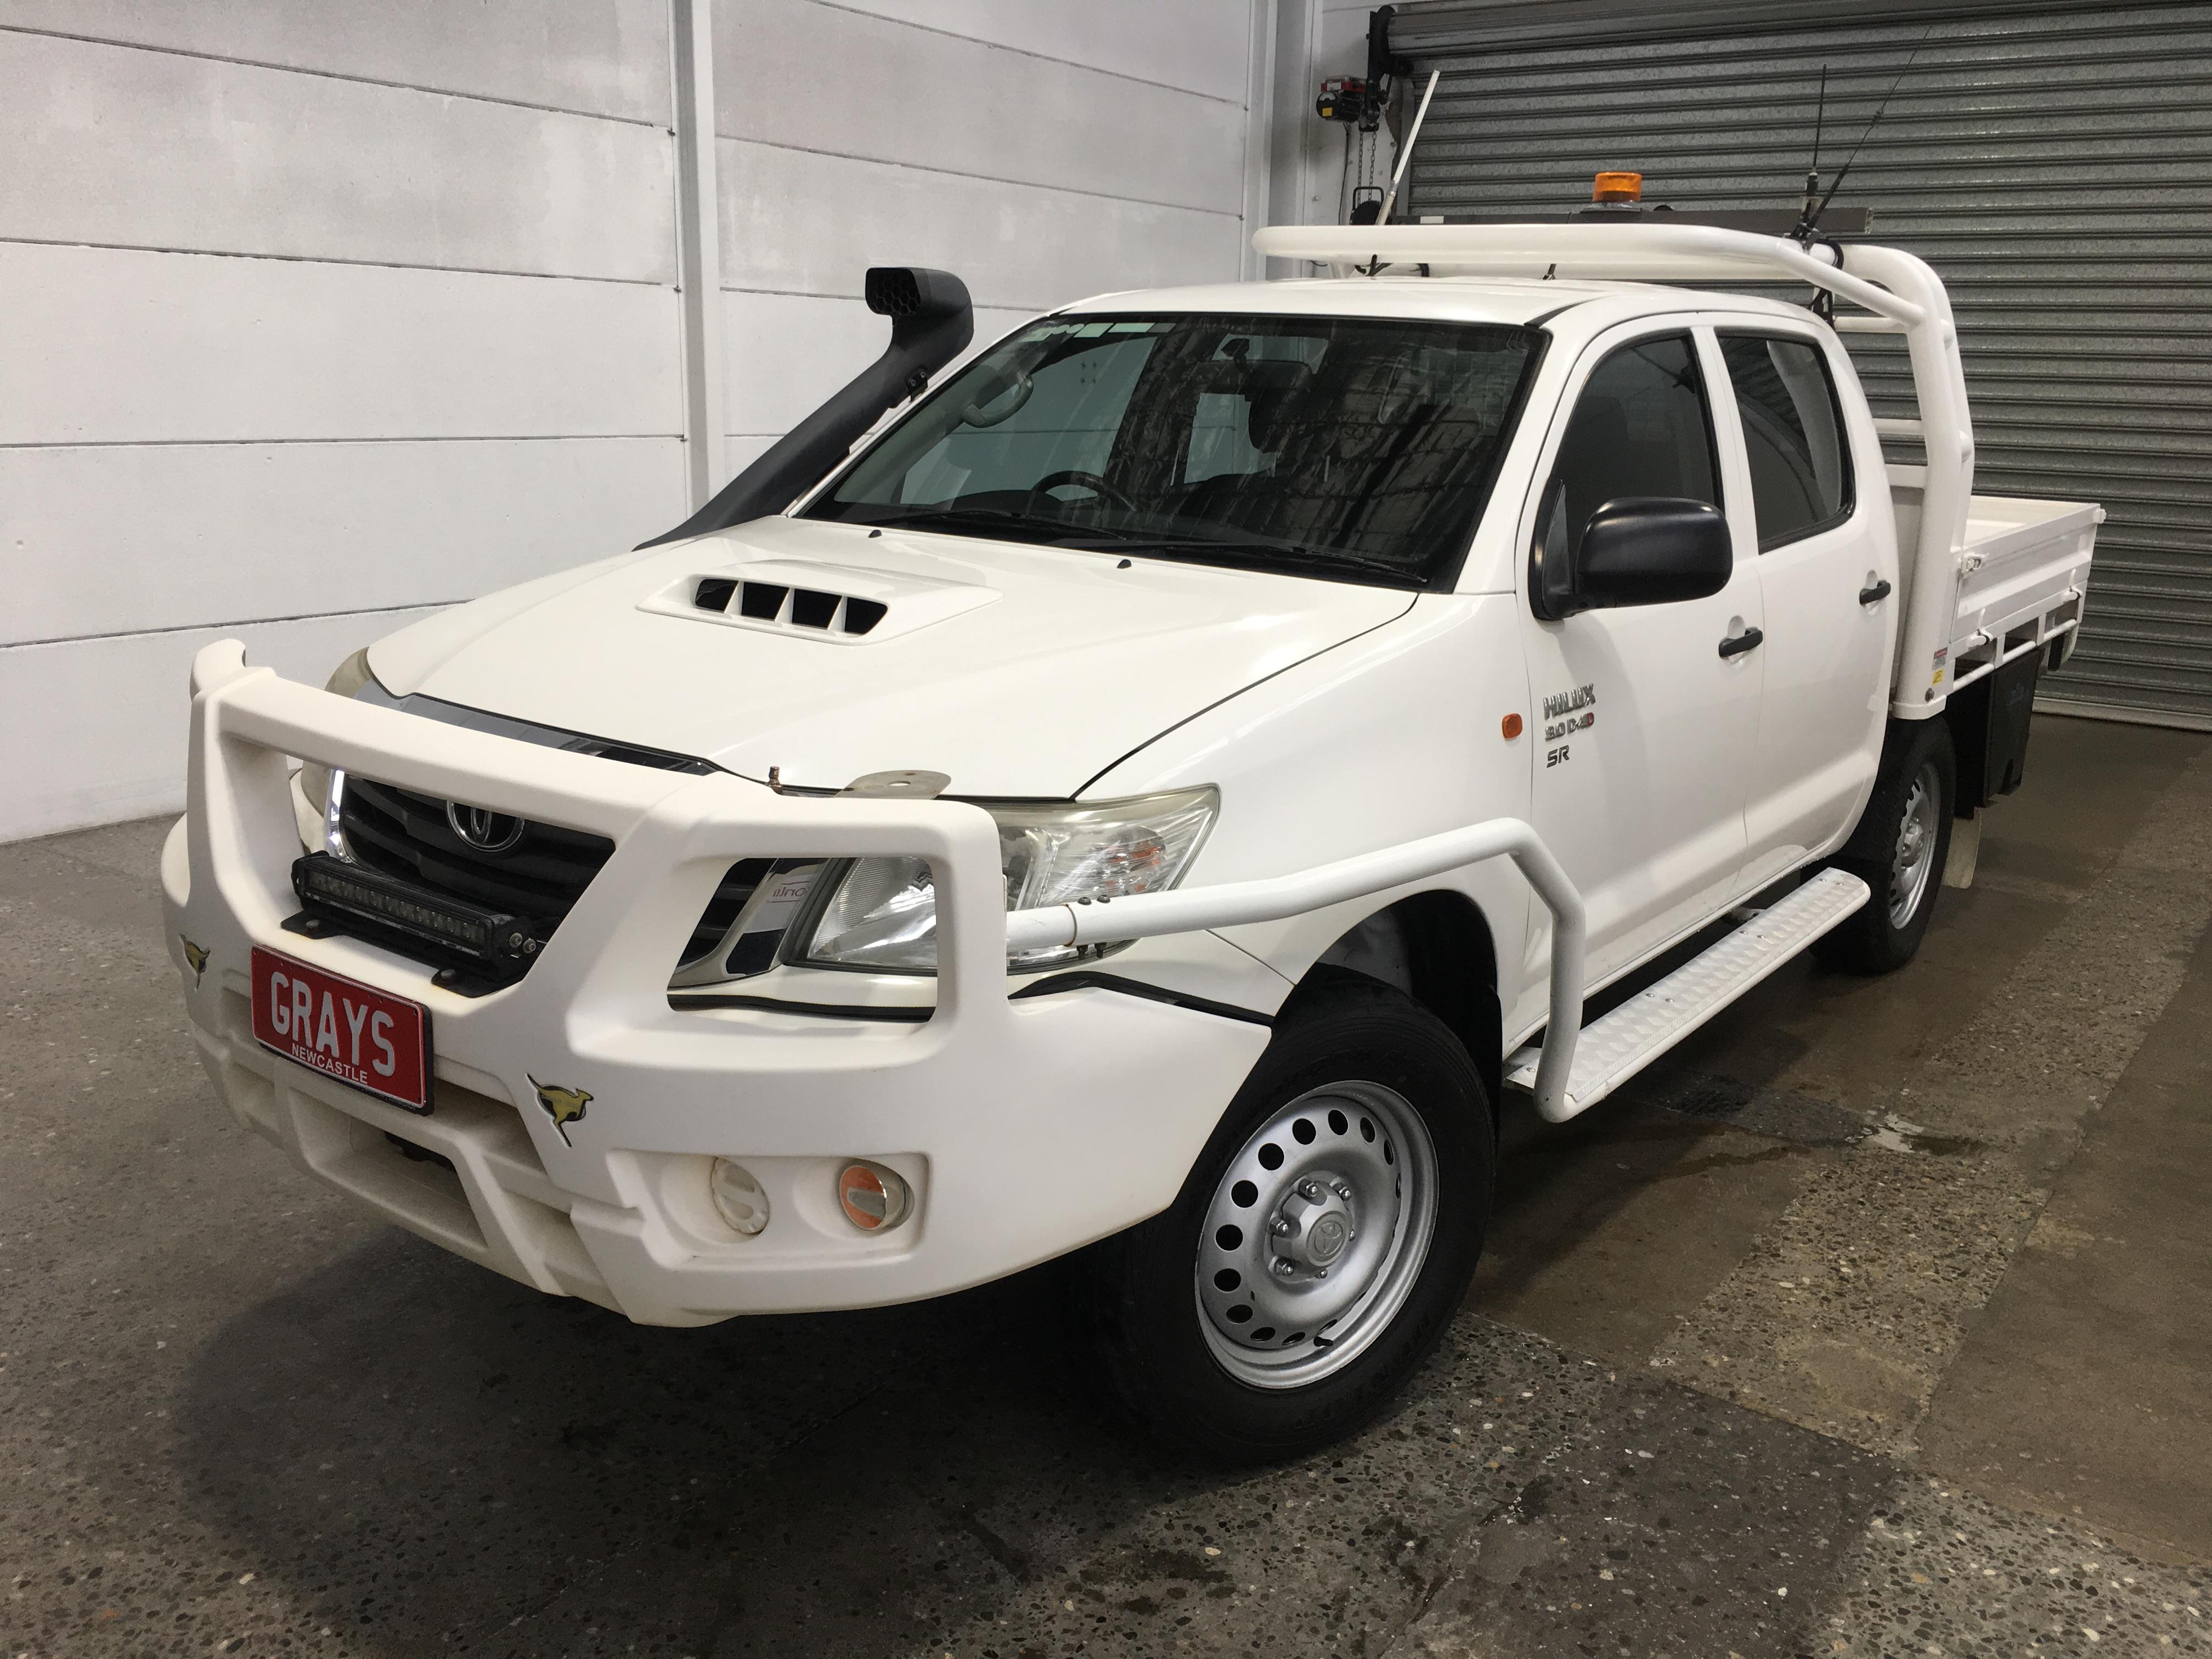 2014 Toyota Hilux 4x4 SR KUN26R Turbo Diesel Automatic Crew Cab Chassis